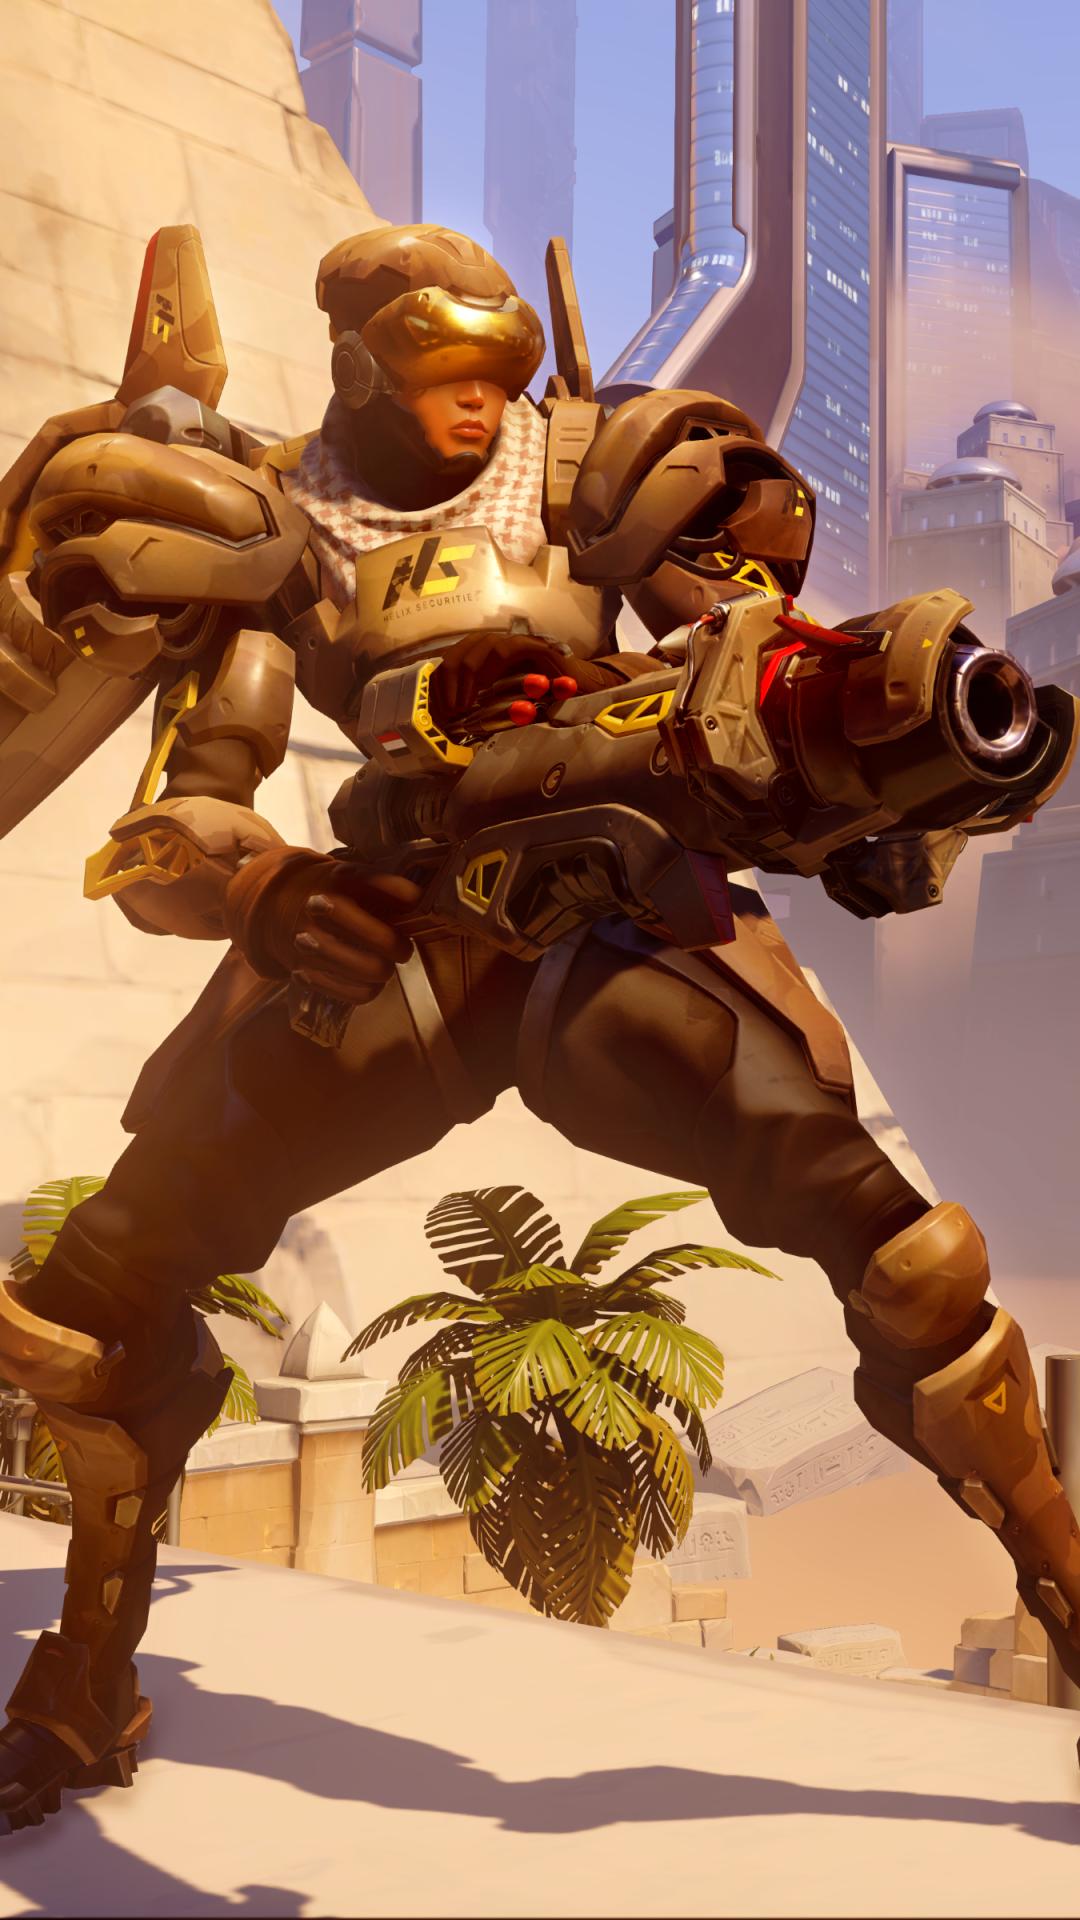 Propaganda Reaper Overwatch Overwatch Hd Gamer